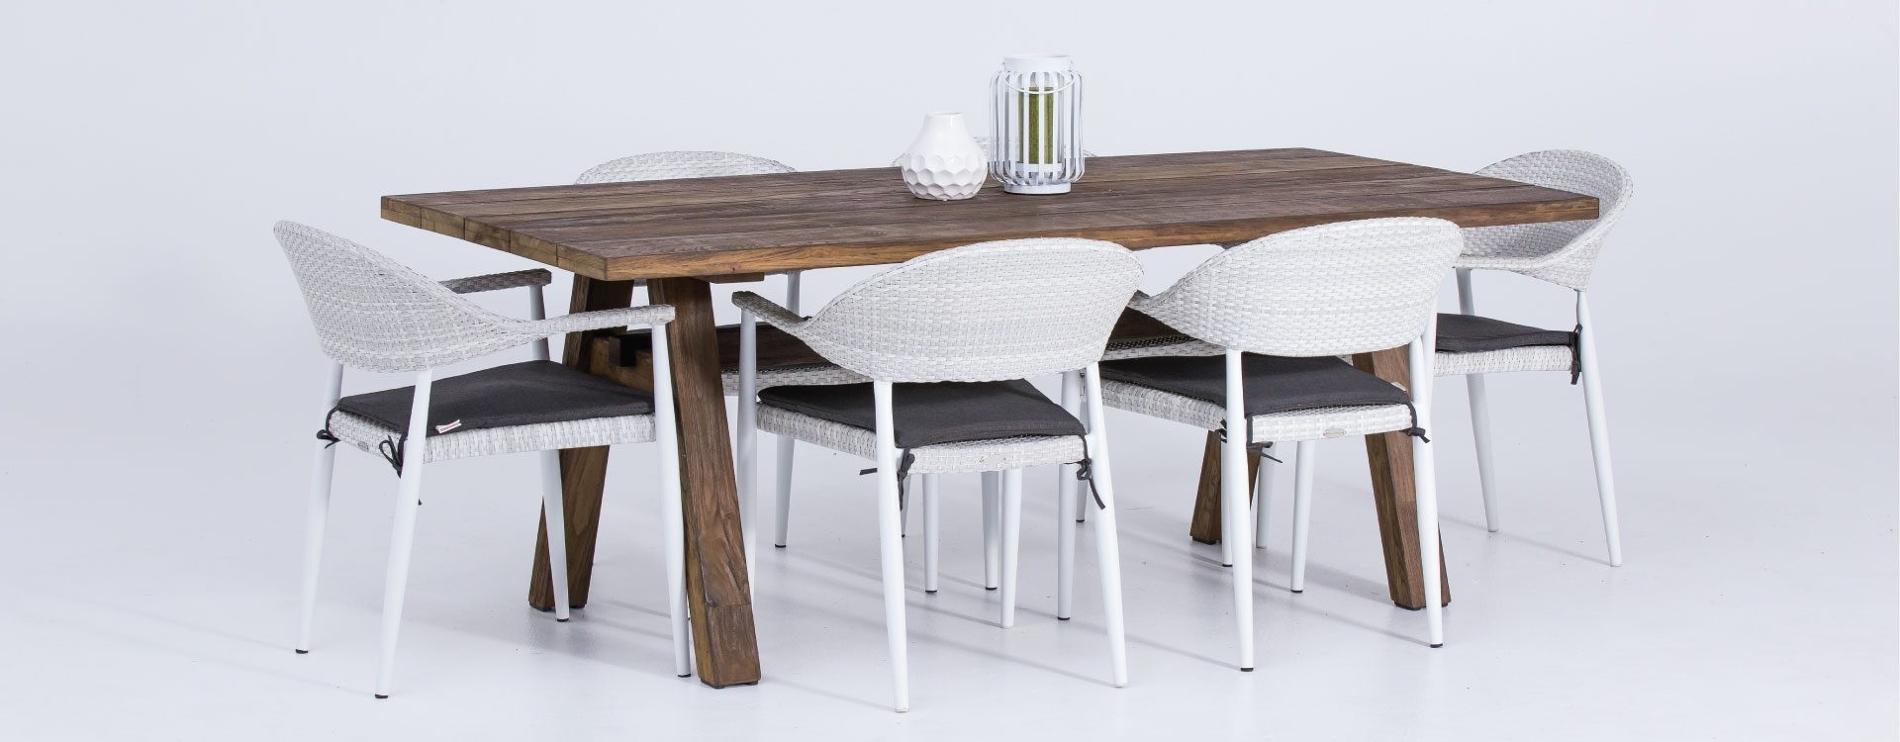 Teak Wooden Table 6 Seater